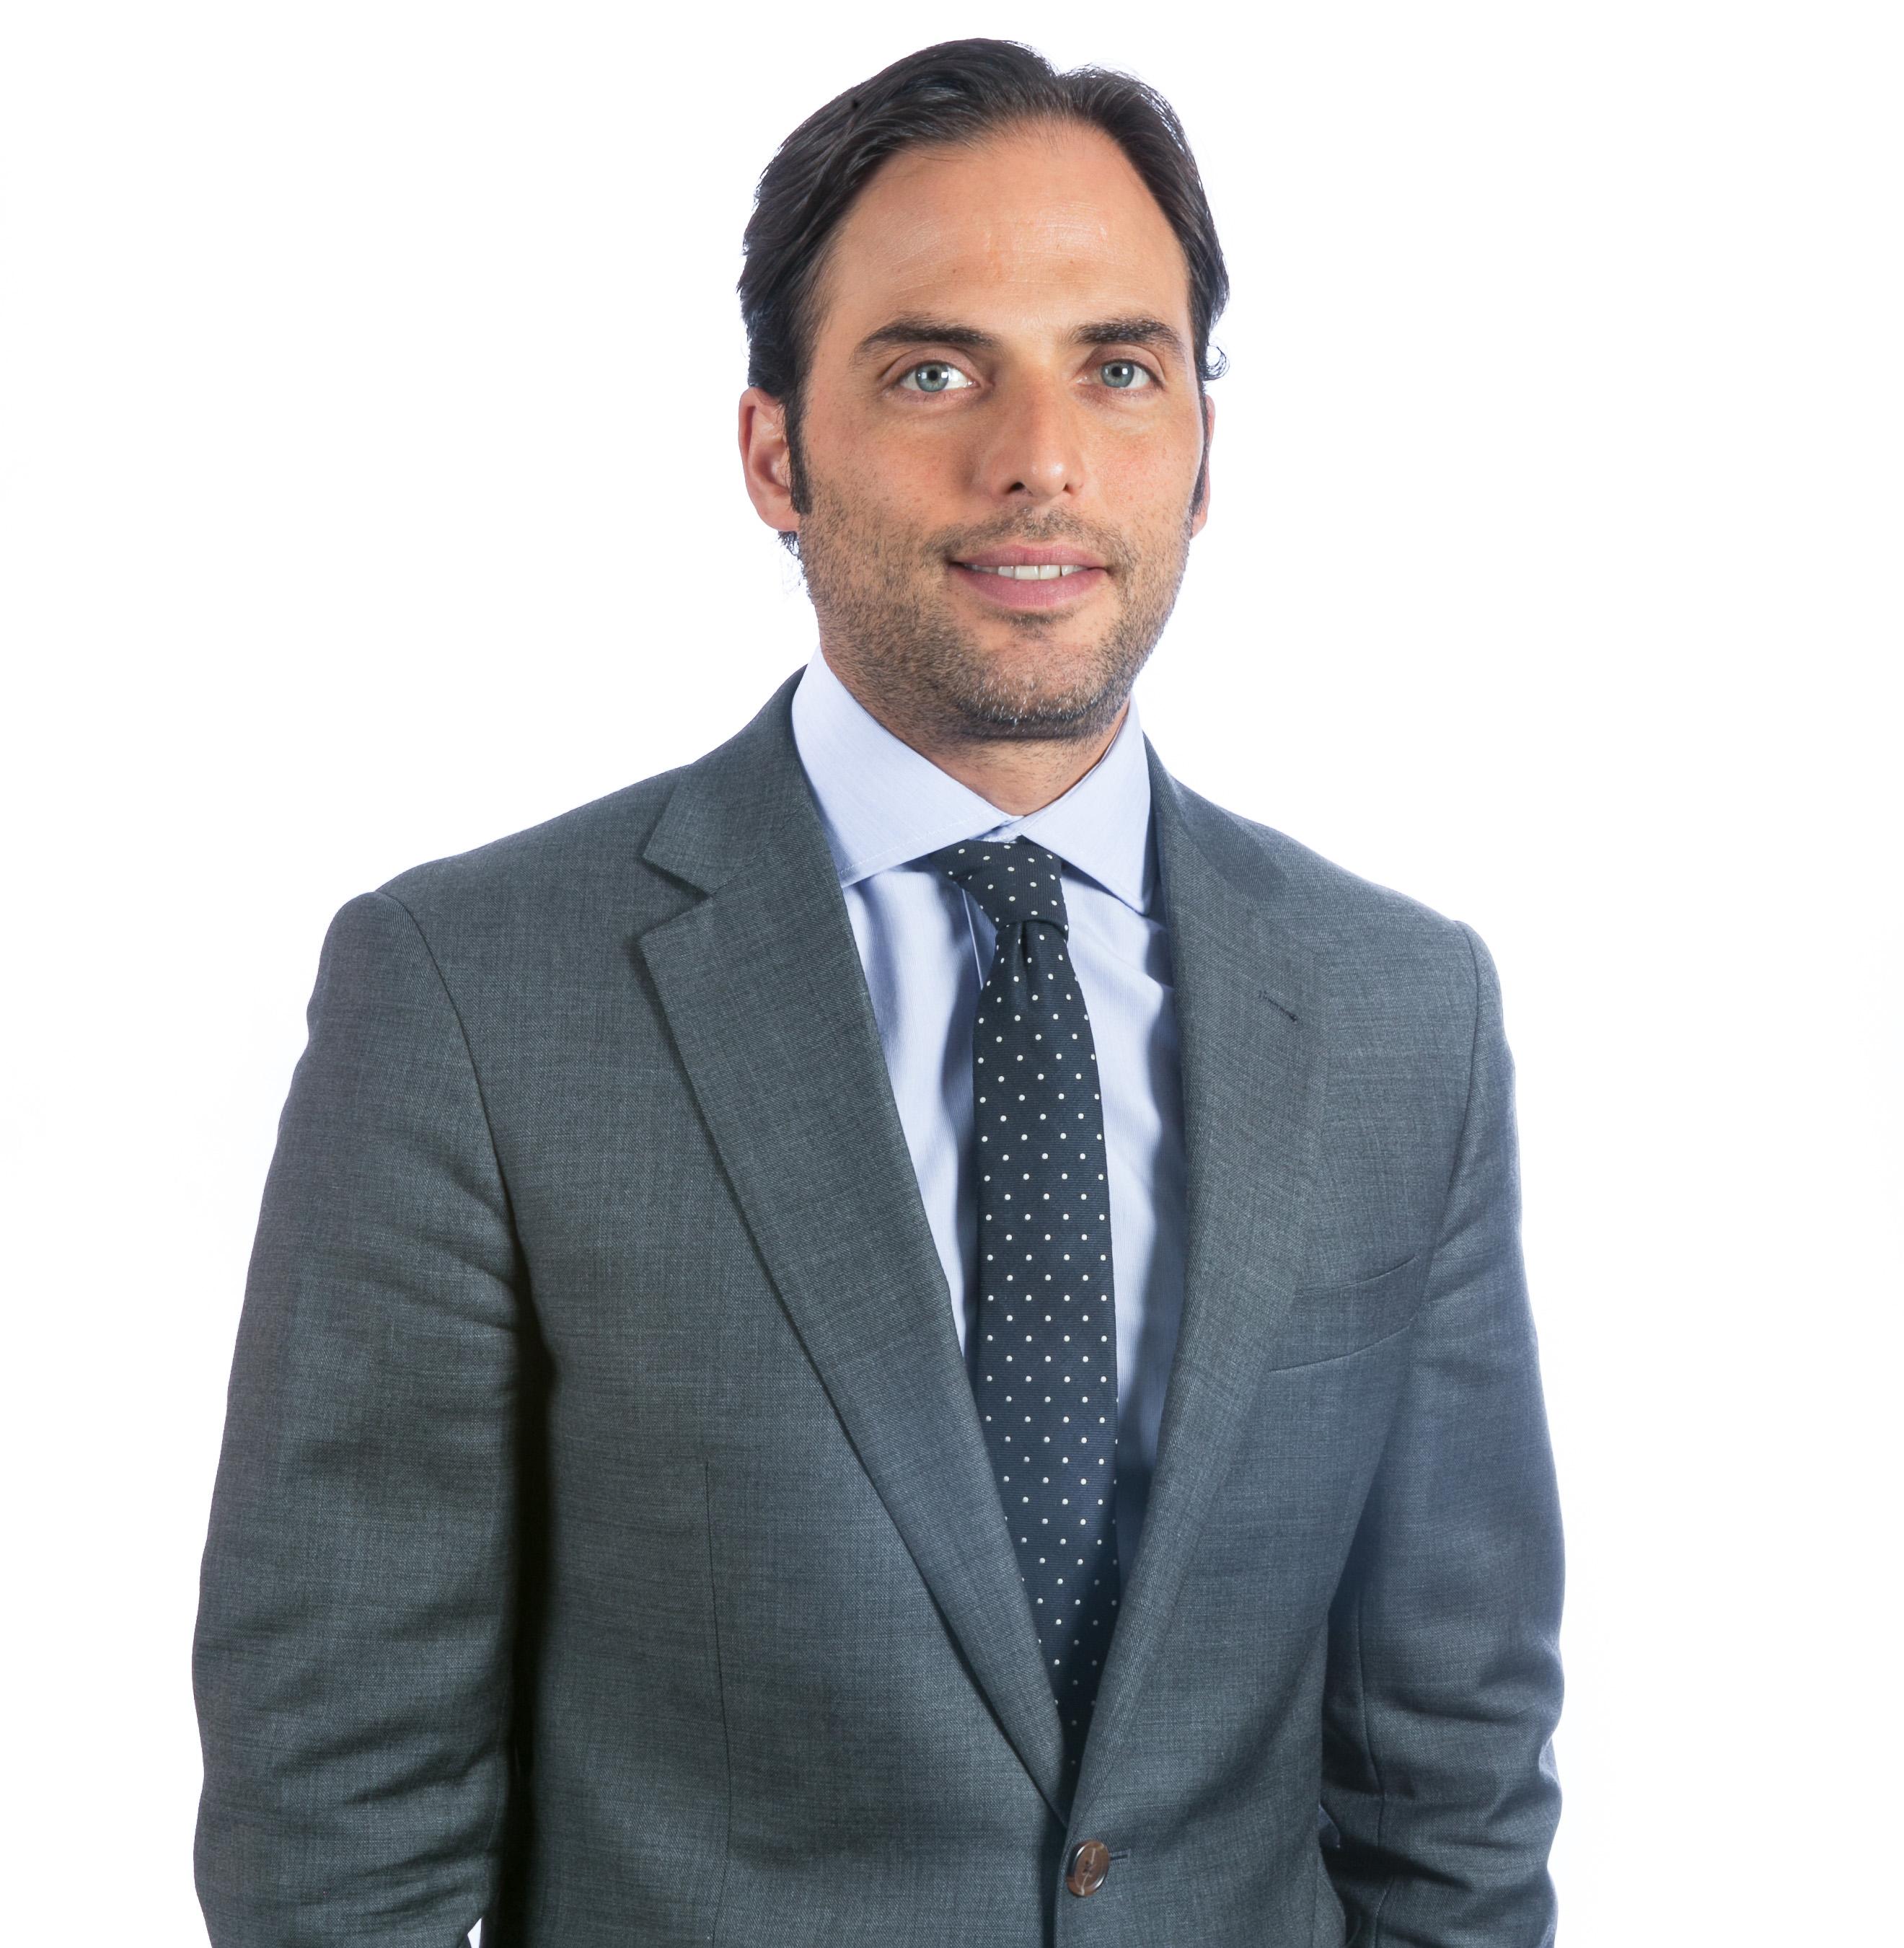 Ernesto Mario Meade Gutiérrez